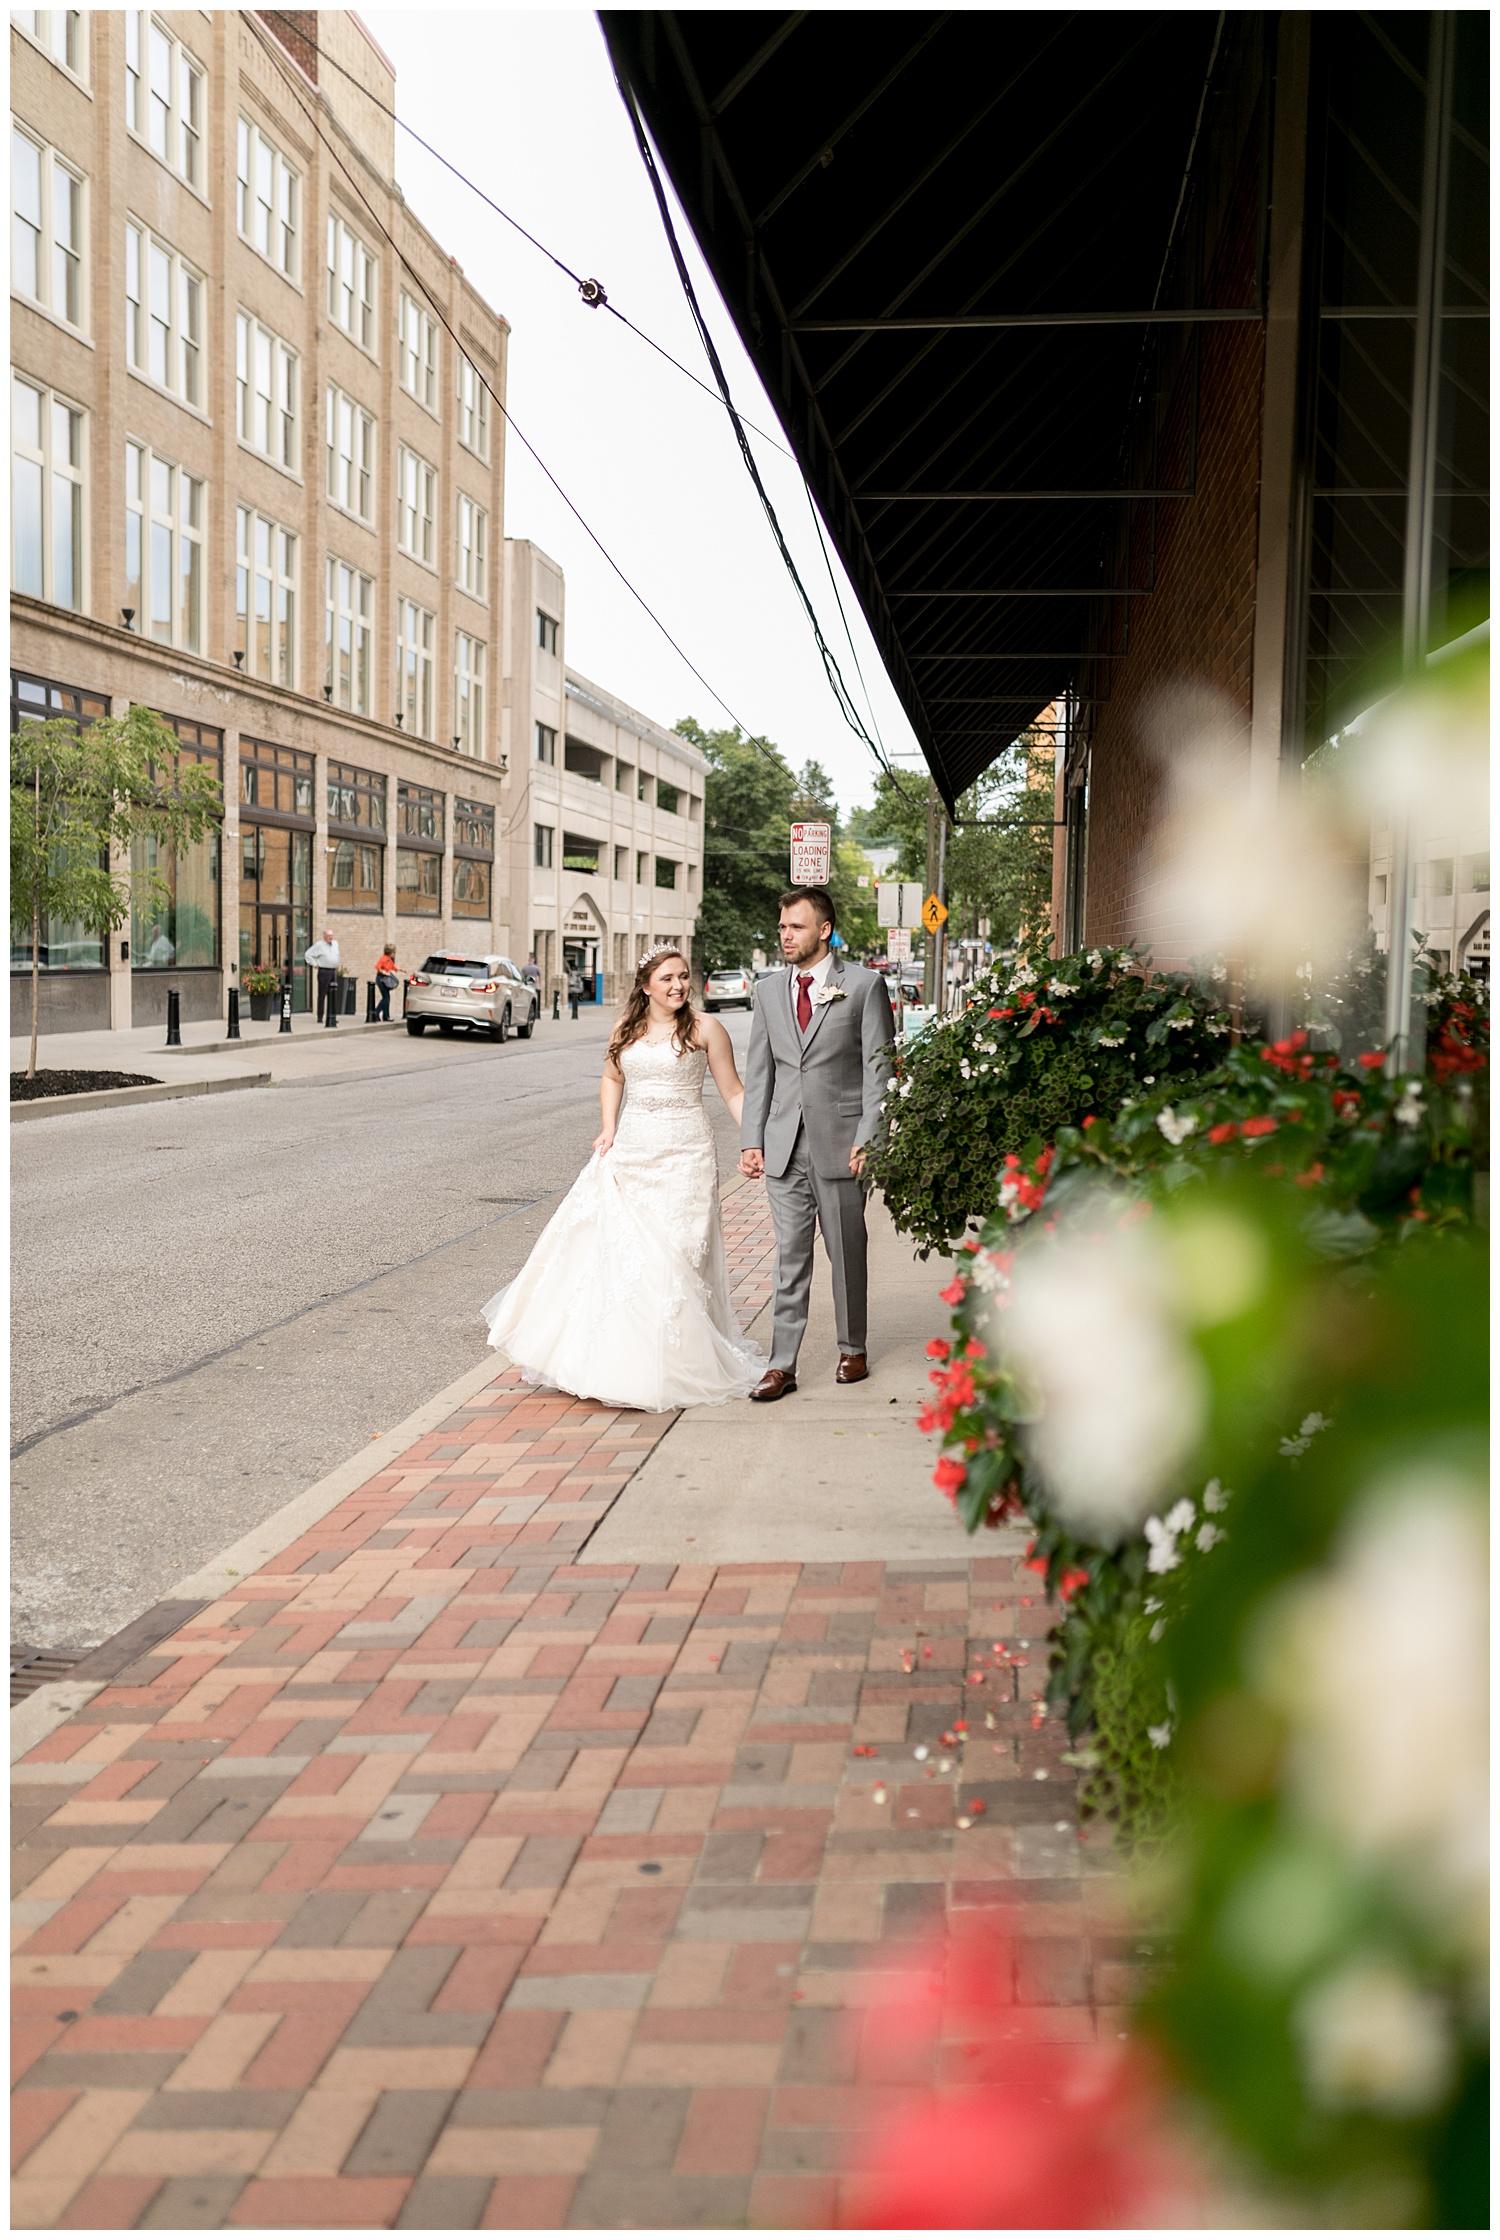 TheSmythCollective-Best-Cincinnati-Wedding-Photographer-Urban-Downtown-Covington-Wedding-31.jpg